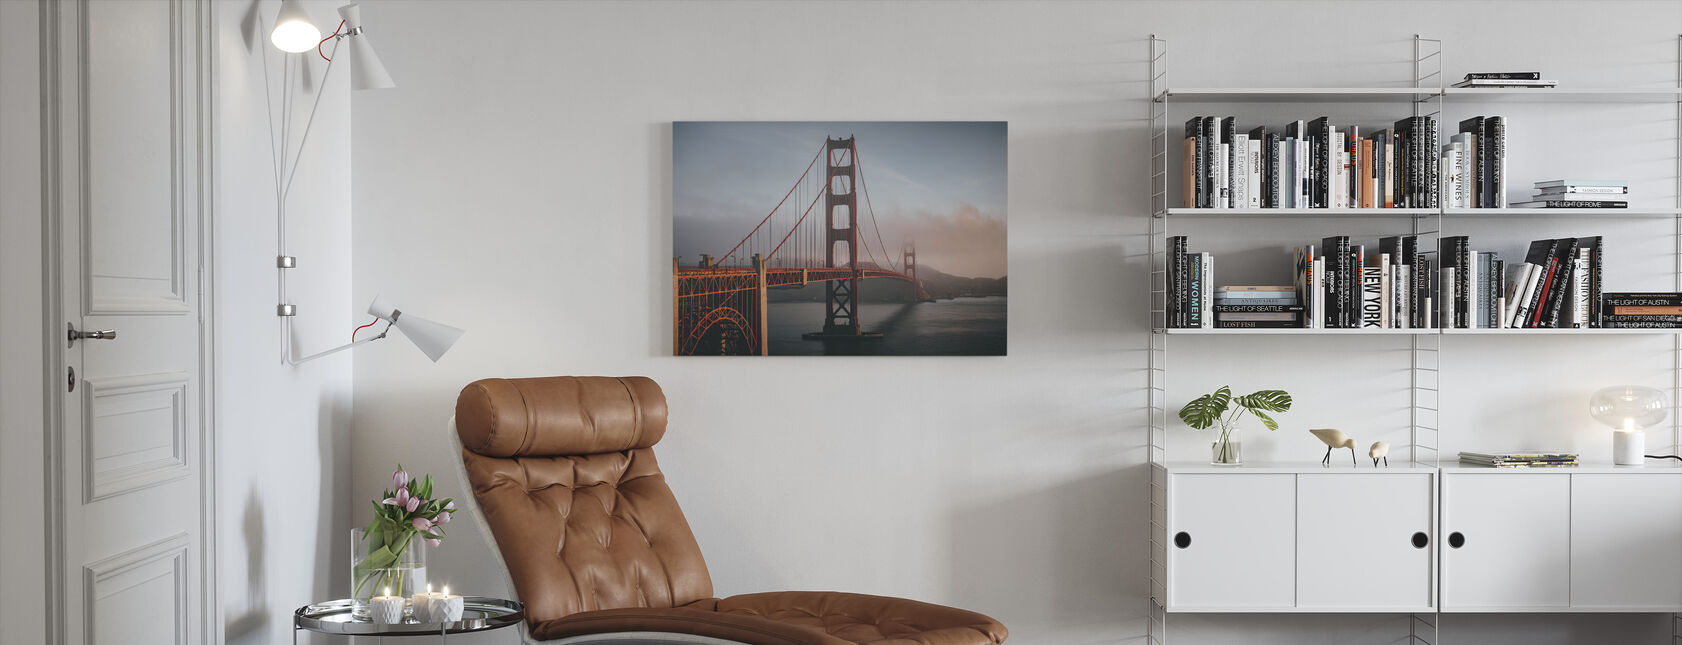 Golden Gate in Fog - Canvas print - Living Room